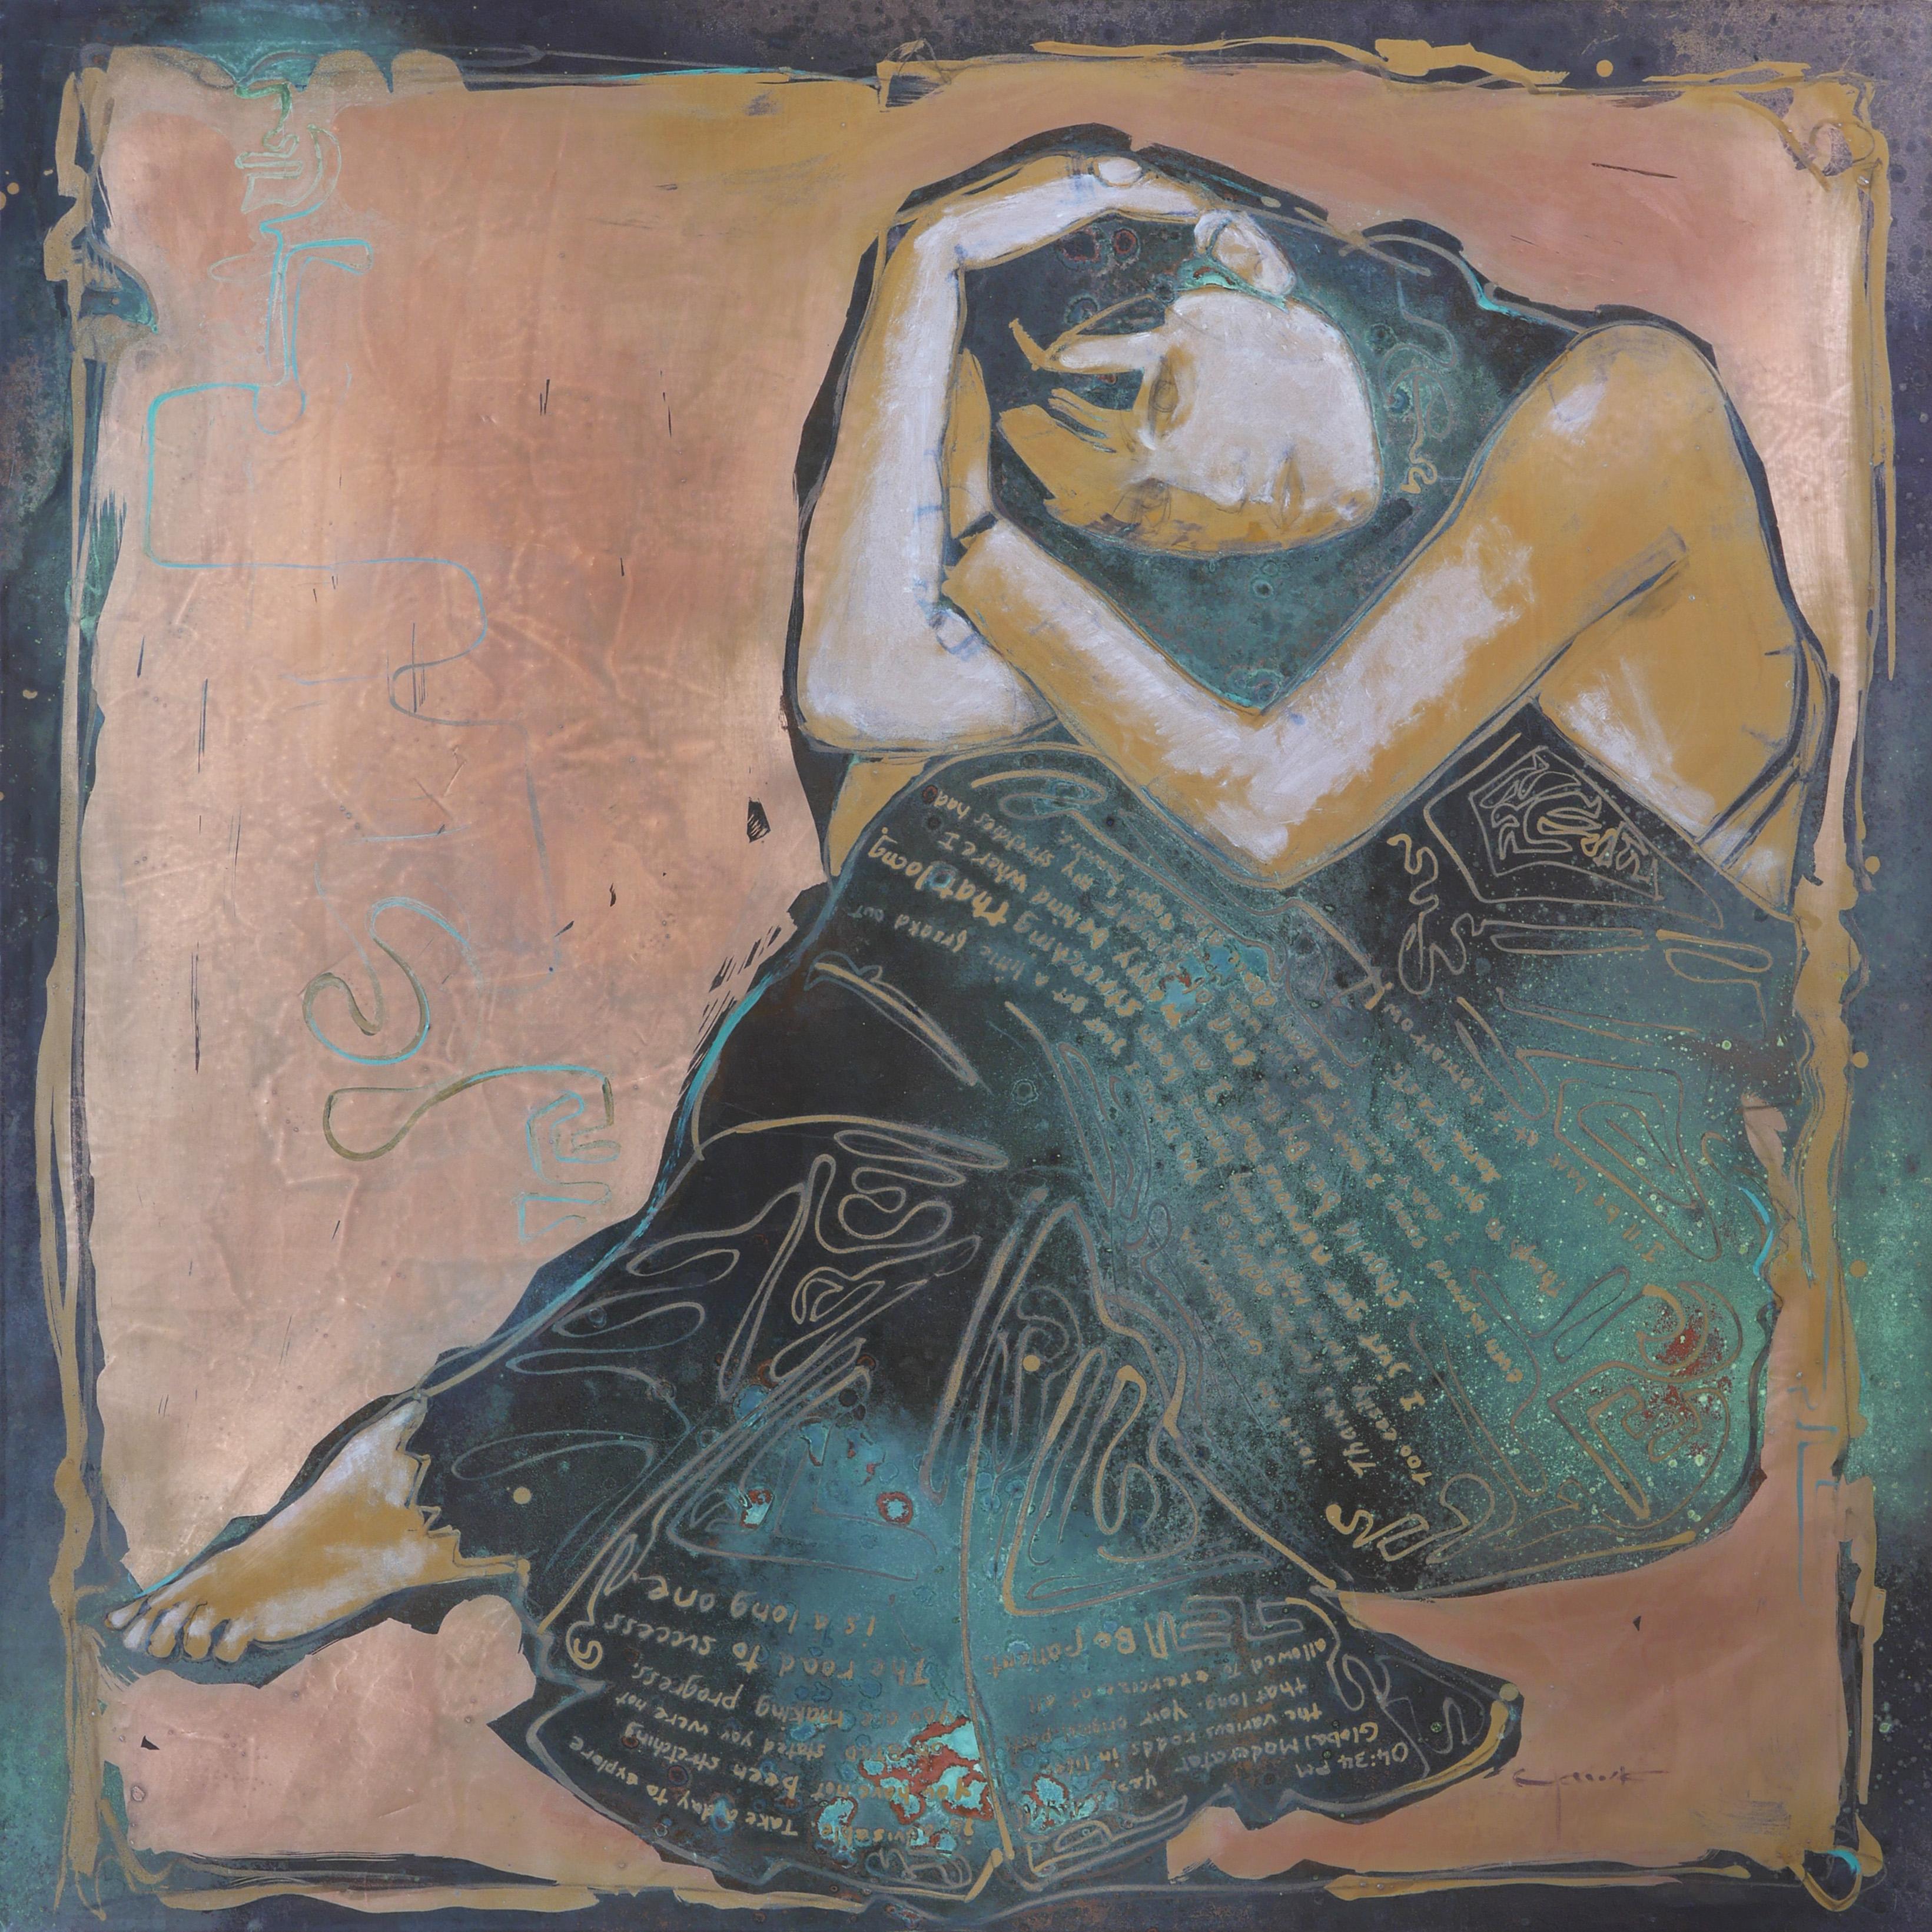 Rest for Dancers - Ballet - Ballerina